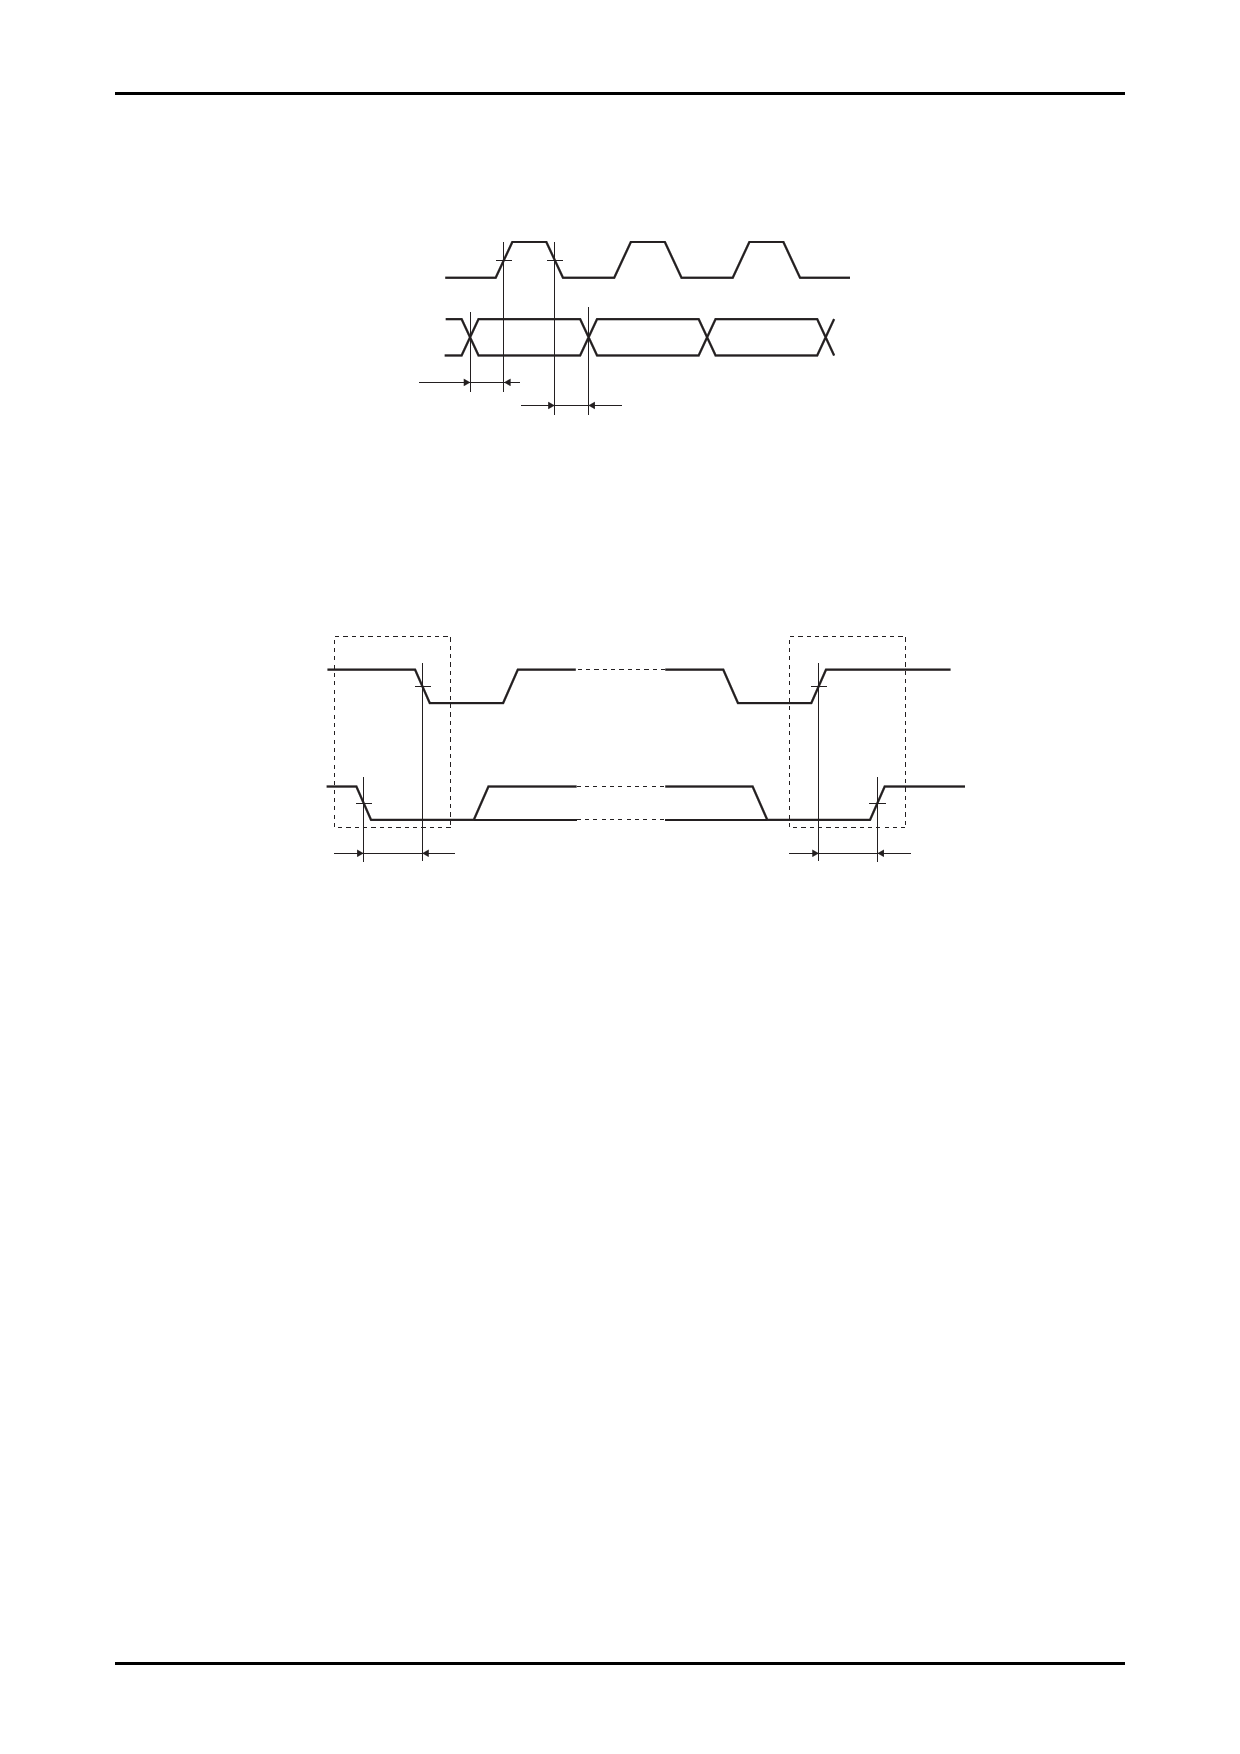 LV8094CT 電子部品, 半導体